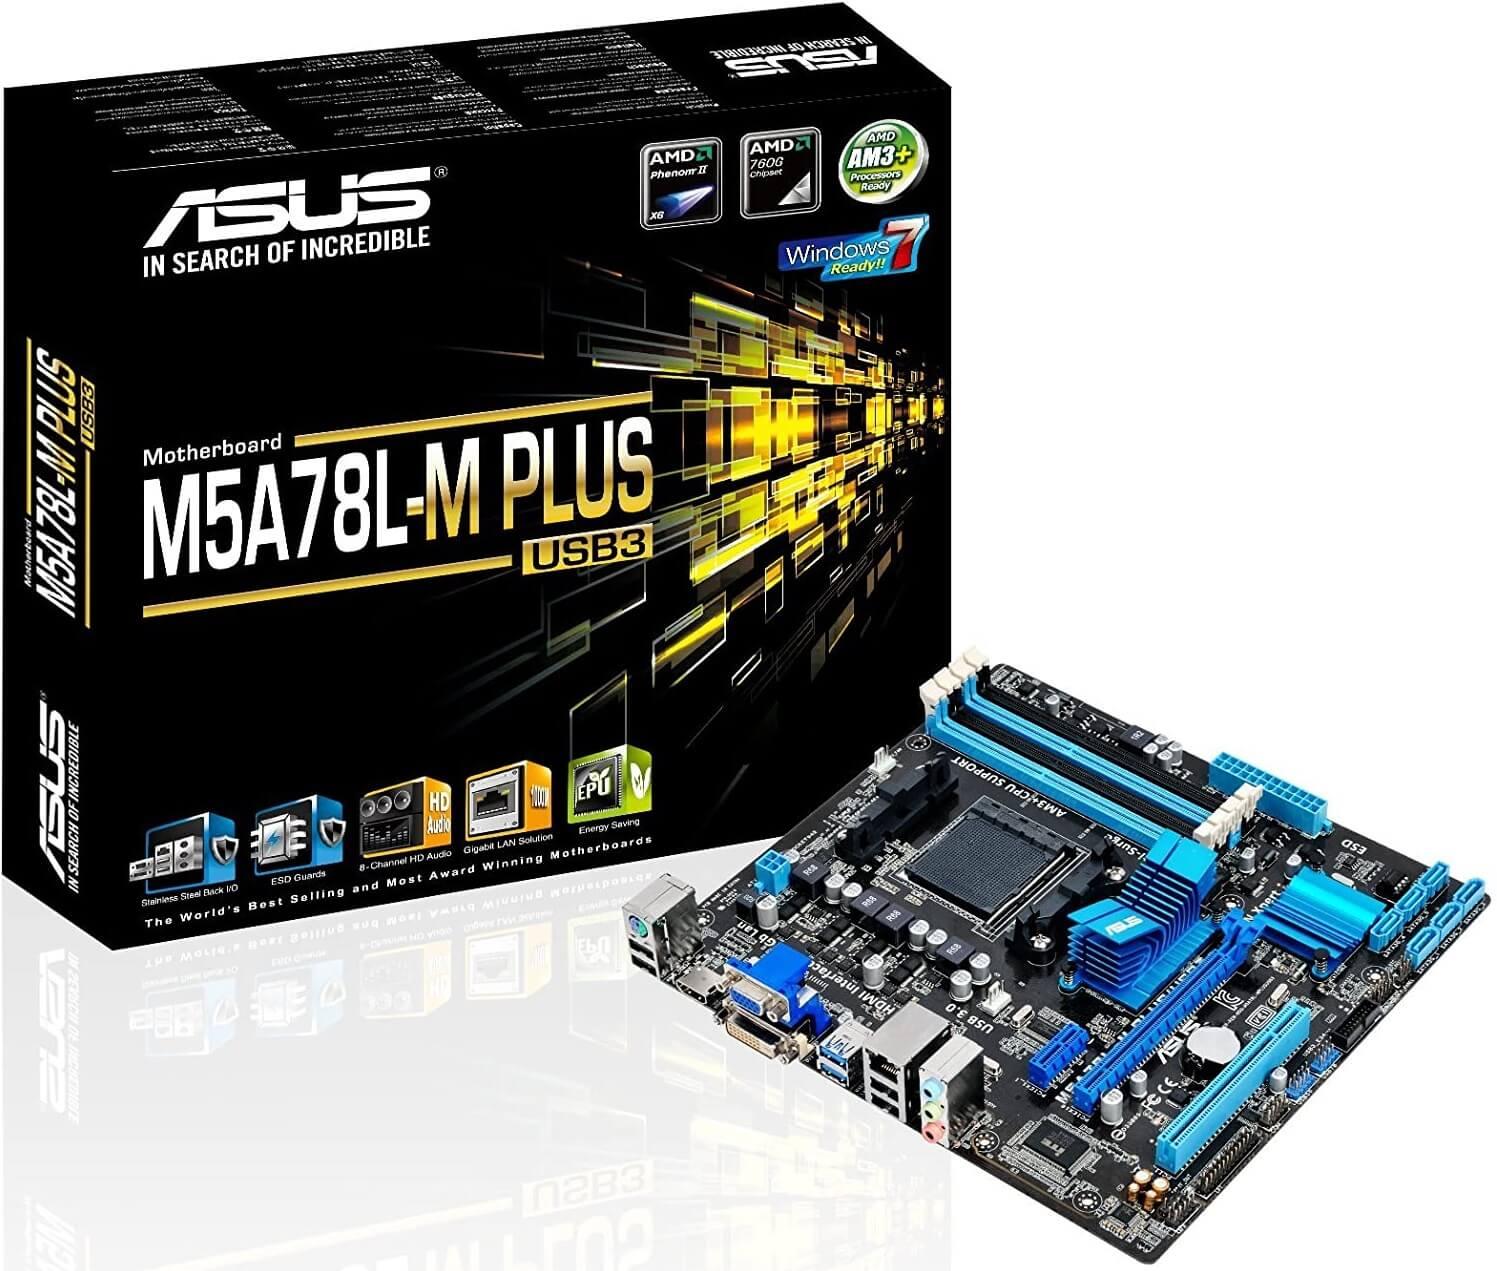 ASUS Motherboard for DDR3